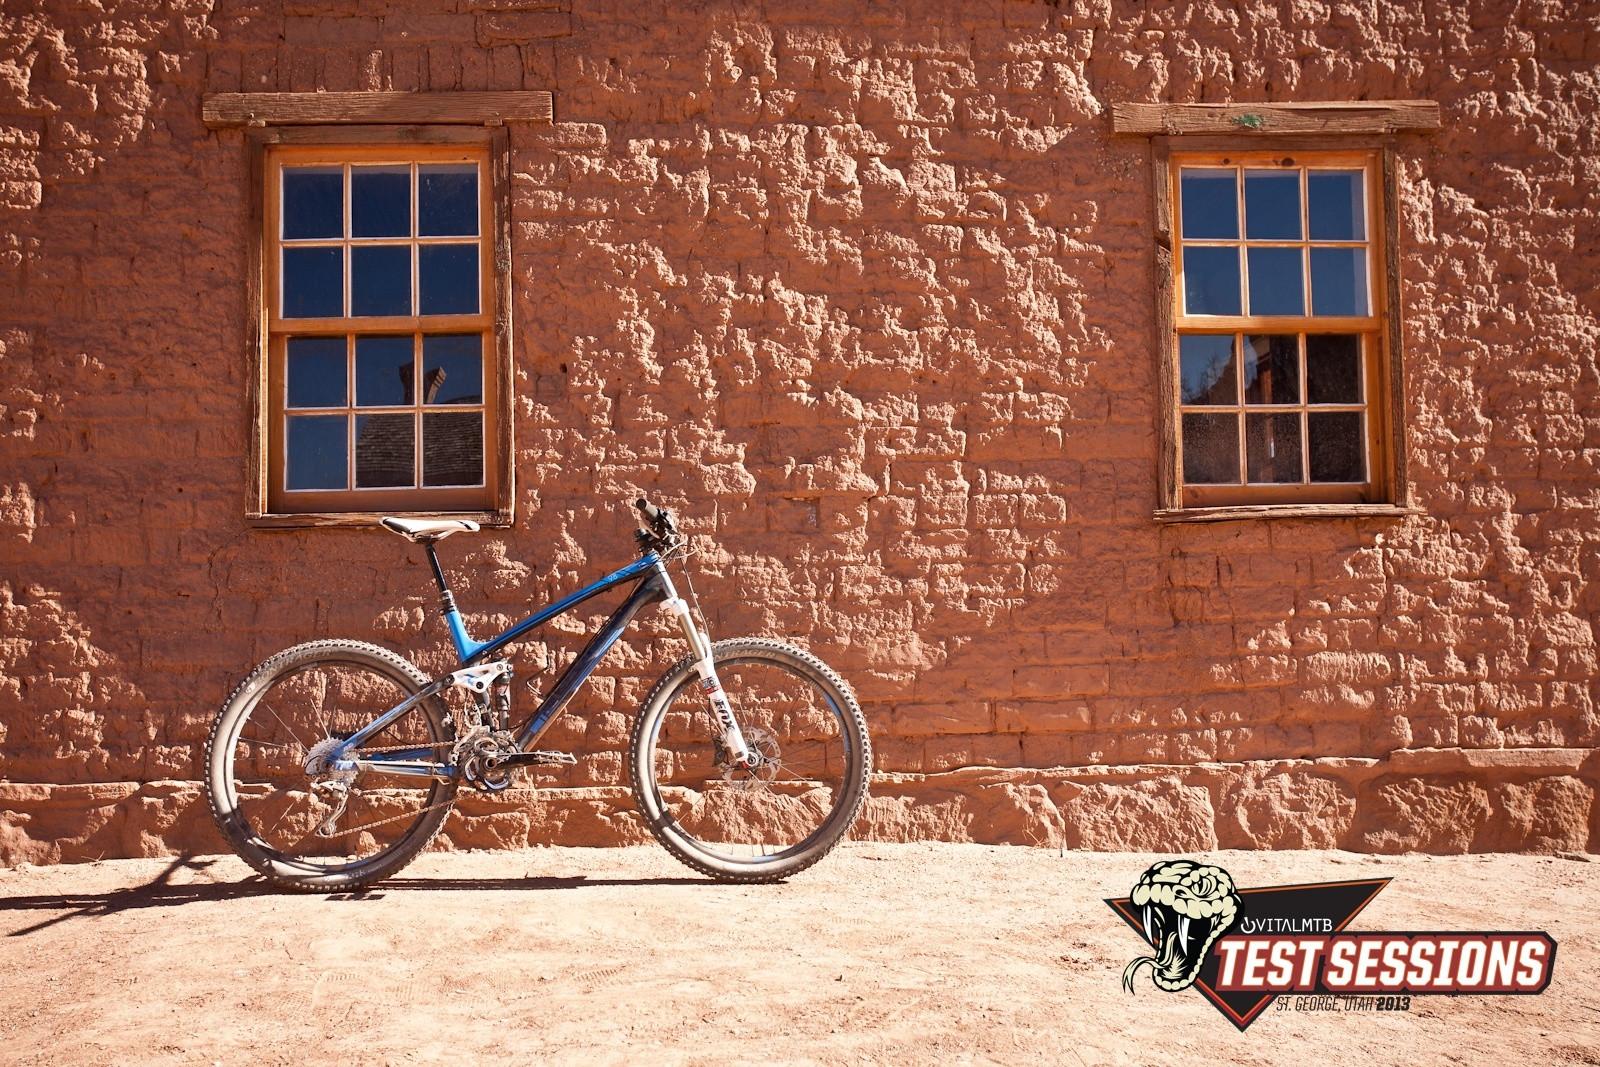 2013 Trek Fuel EX 9.8 from Vital MTB Test Sessions - 2013 Trek Fuel EX 9.8 from Vital MTB Test Sessions - Mountain Biking Pictures - Vital MTB